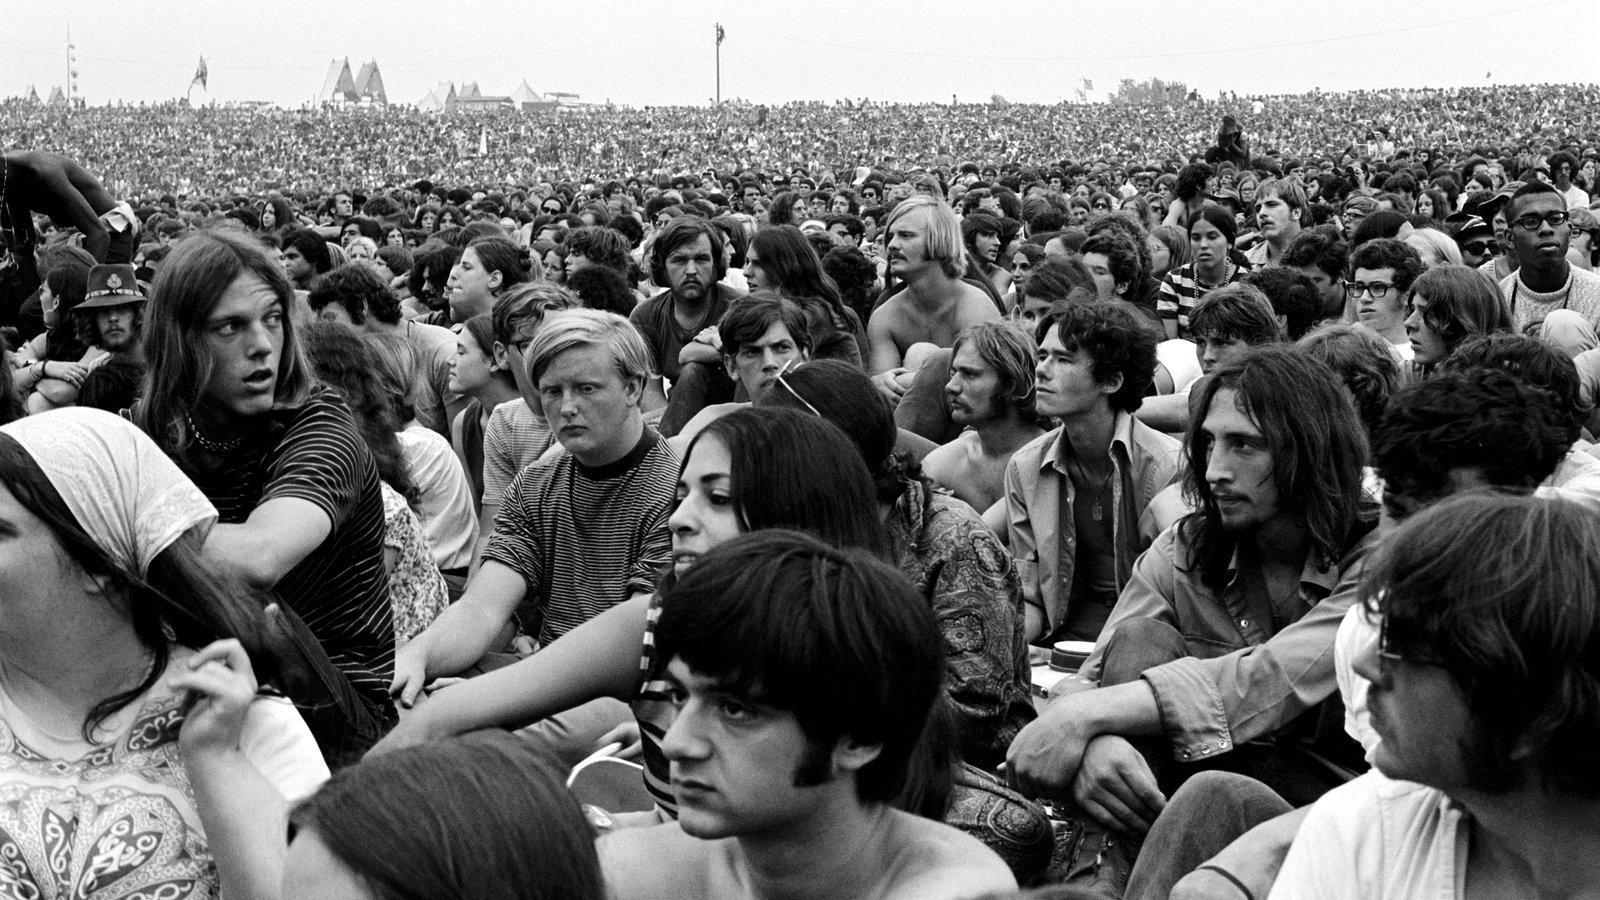 Mισό εκατομμύριο άνθρωποι μαζεύτηκαν σε μια μικρή φάρμα γαλακτοκομικών έξω από την Νέα Υόρκη, τον Αύγουστο του 1969